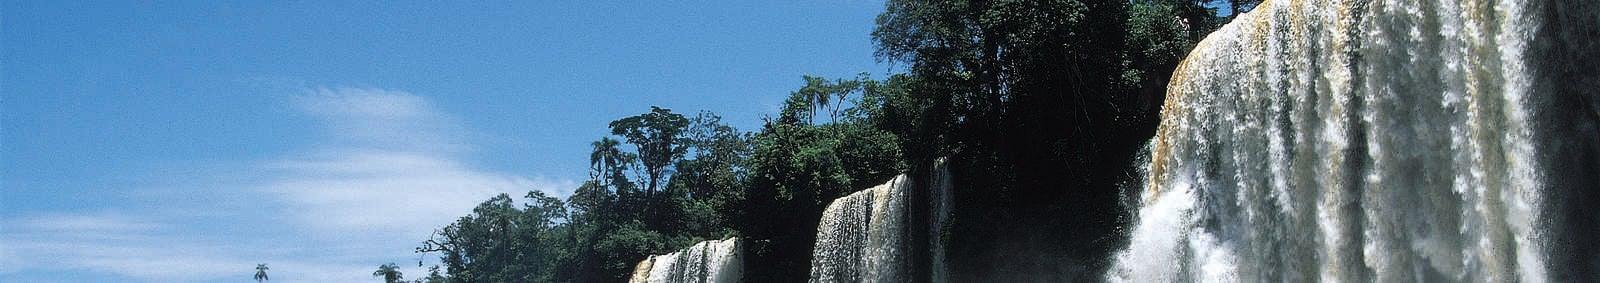 Iguazu falls, Argentina